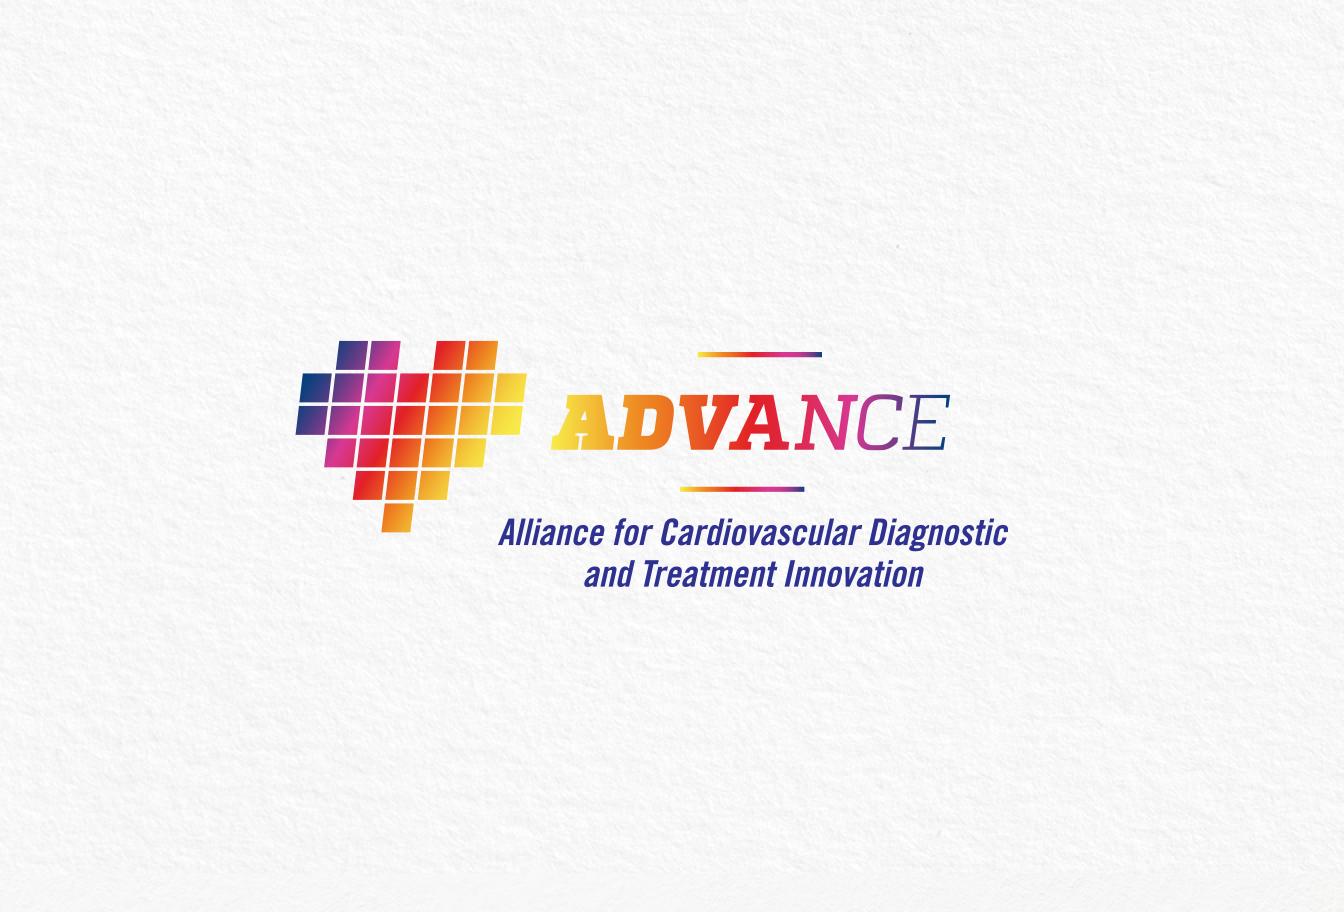 Johns-Hopkins-ADVANCE-6.jpg